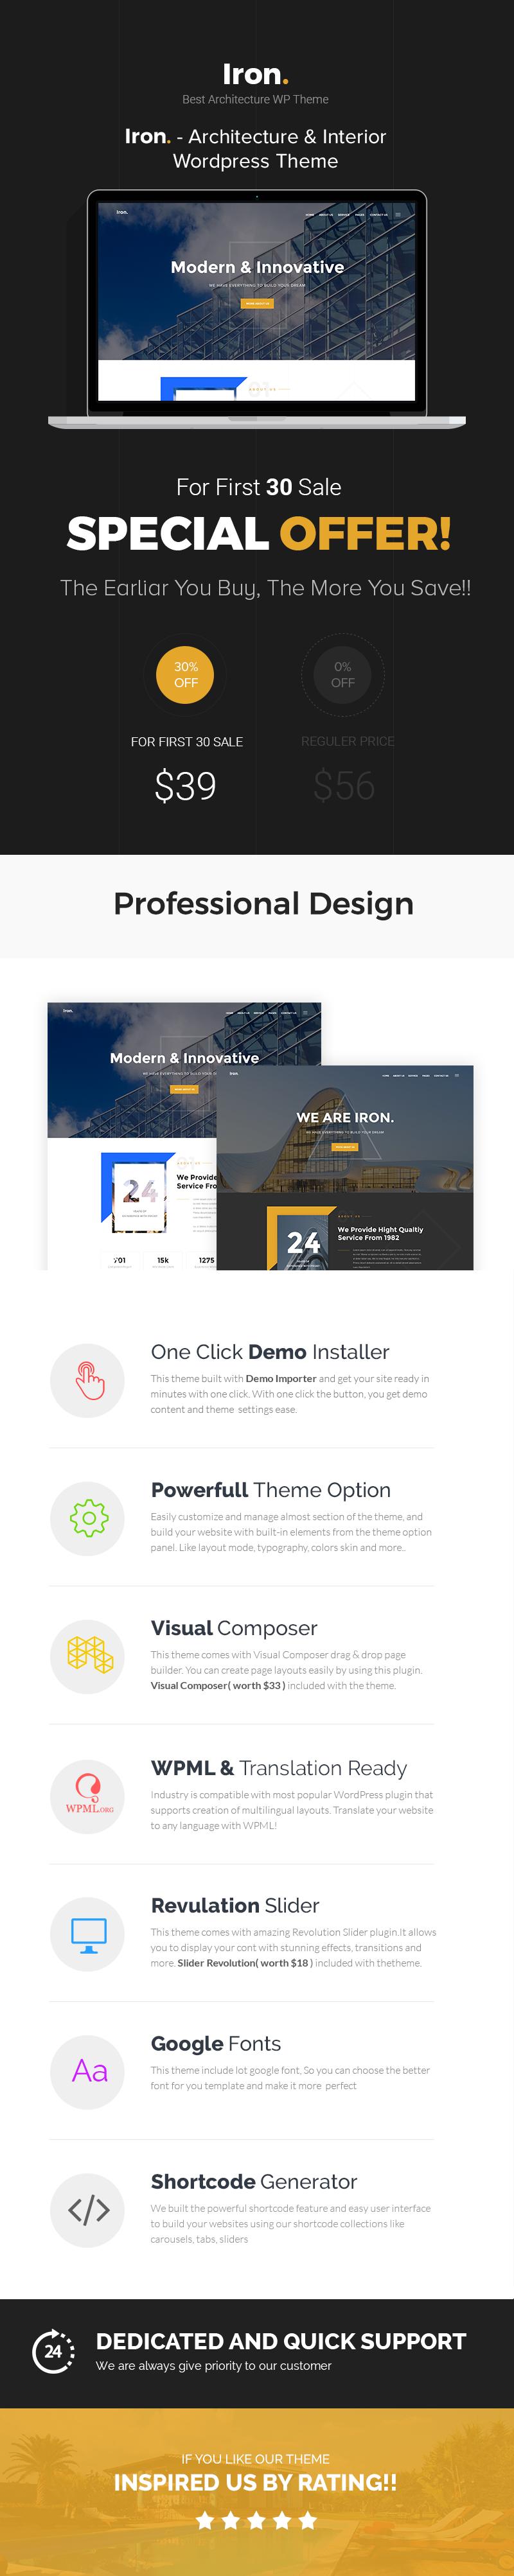 Iron - Architecture, Interior and Design WordPress Theme - 1